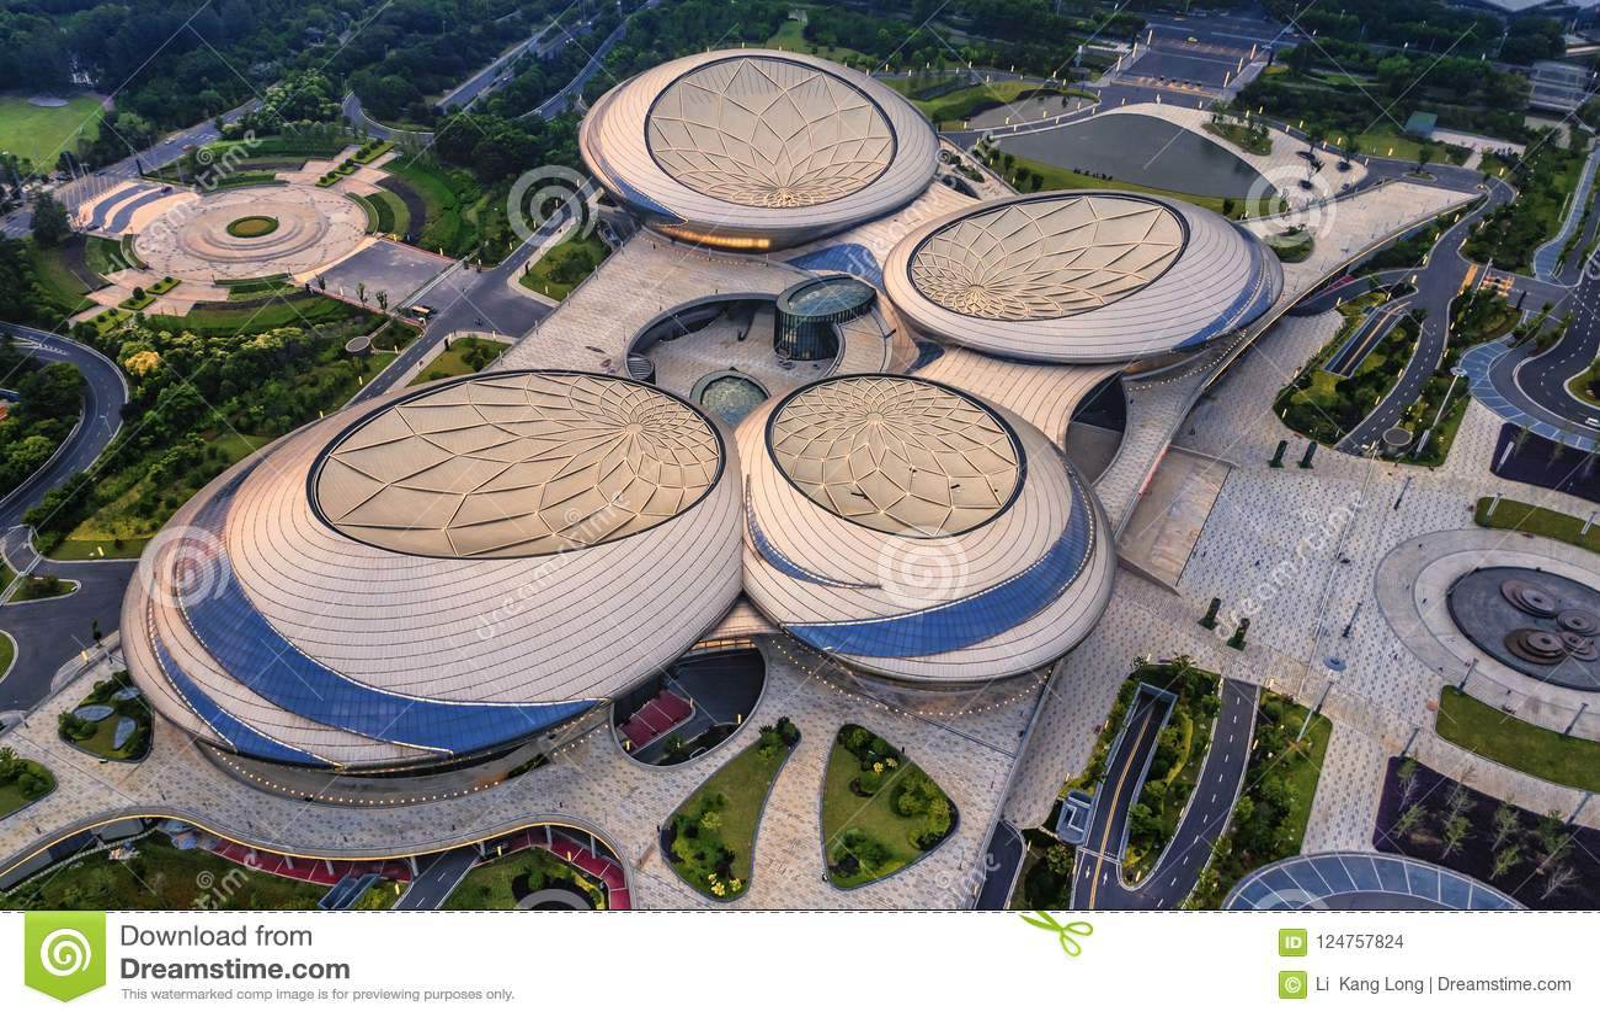 Aerial photography - Jiangsu Grand Theatre